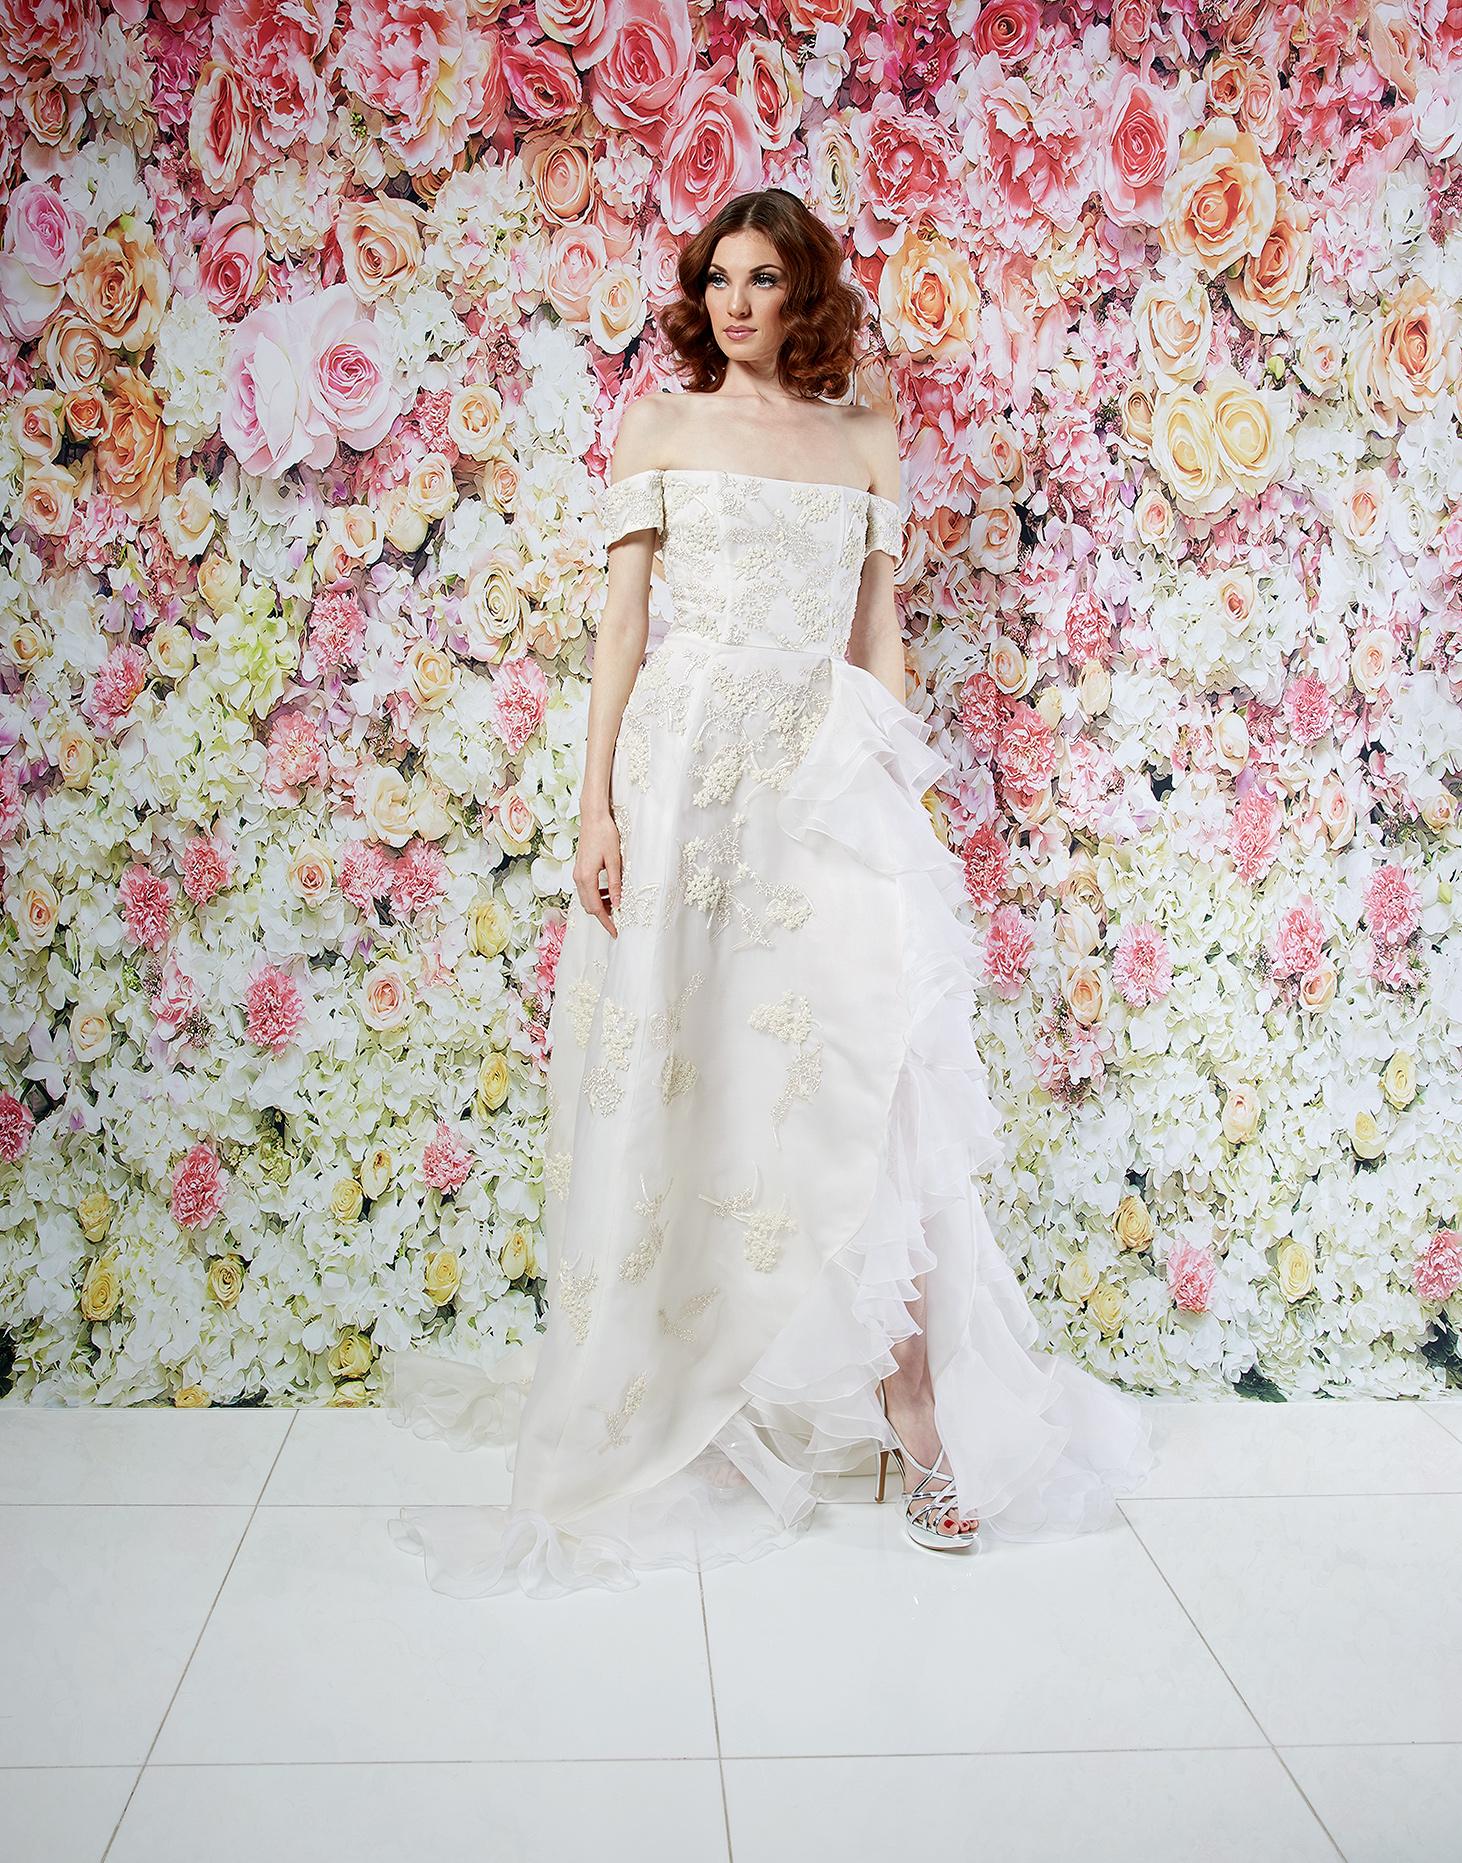 randi rahm wedding dress spring 2019 off-the-shoulder ruffle slit detail